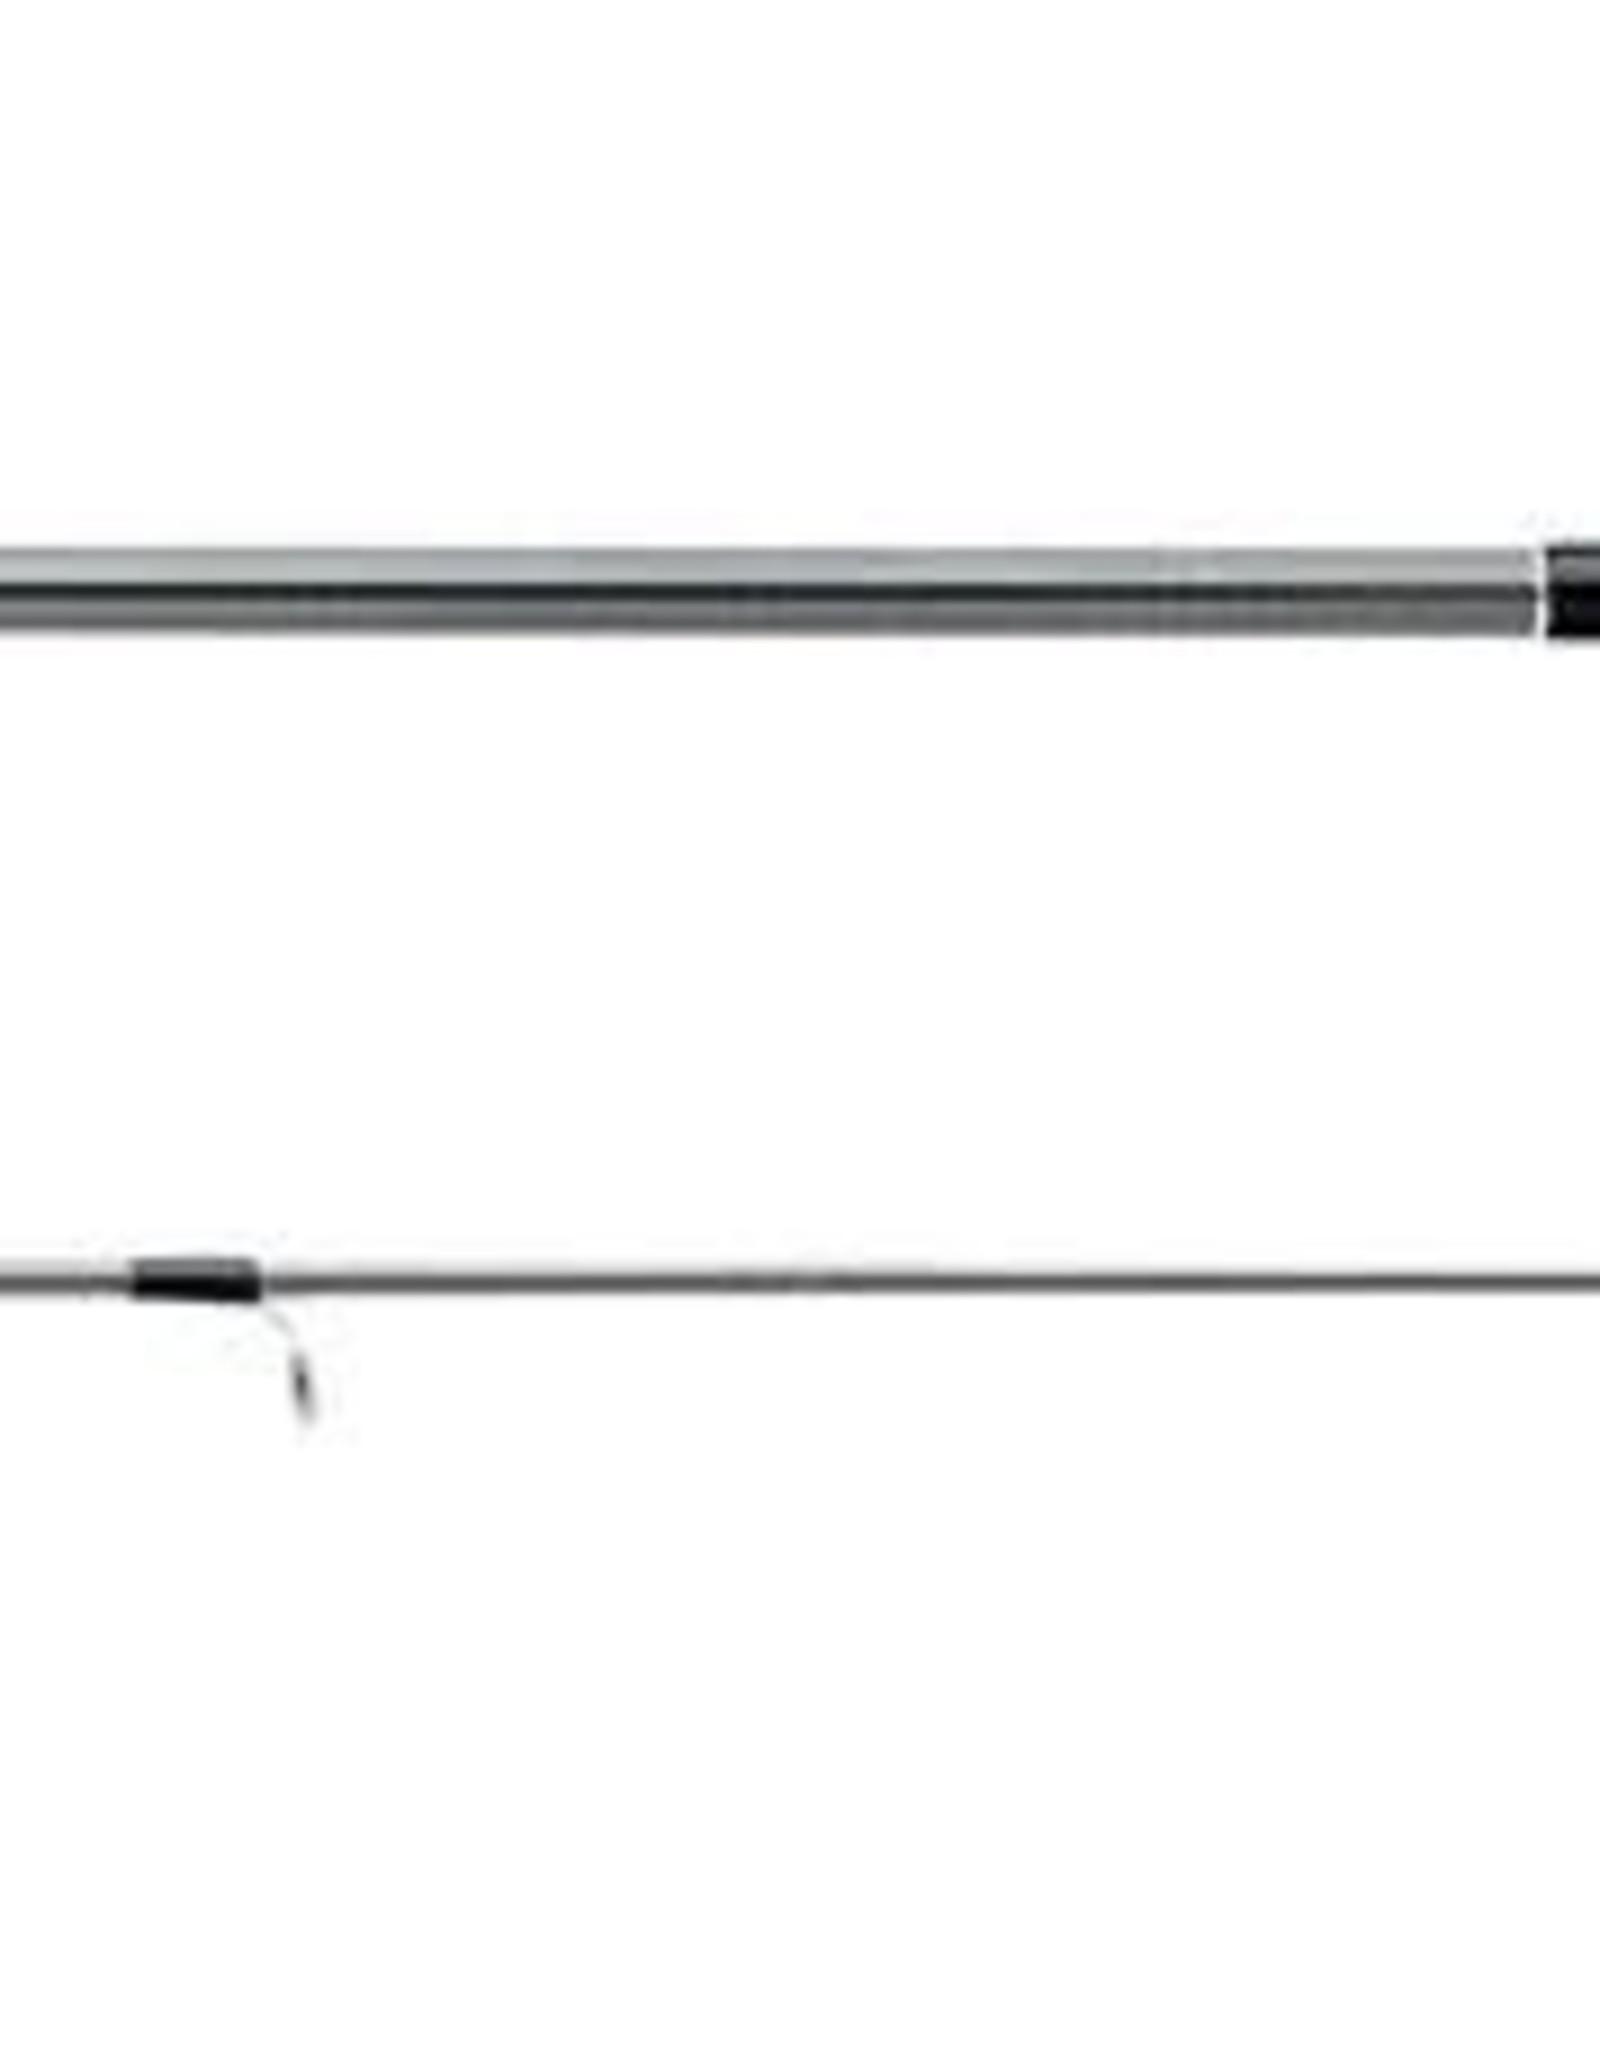 Daiwa Daiwa Tatula XT Spinning Rod